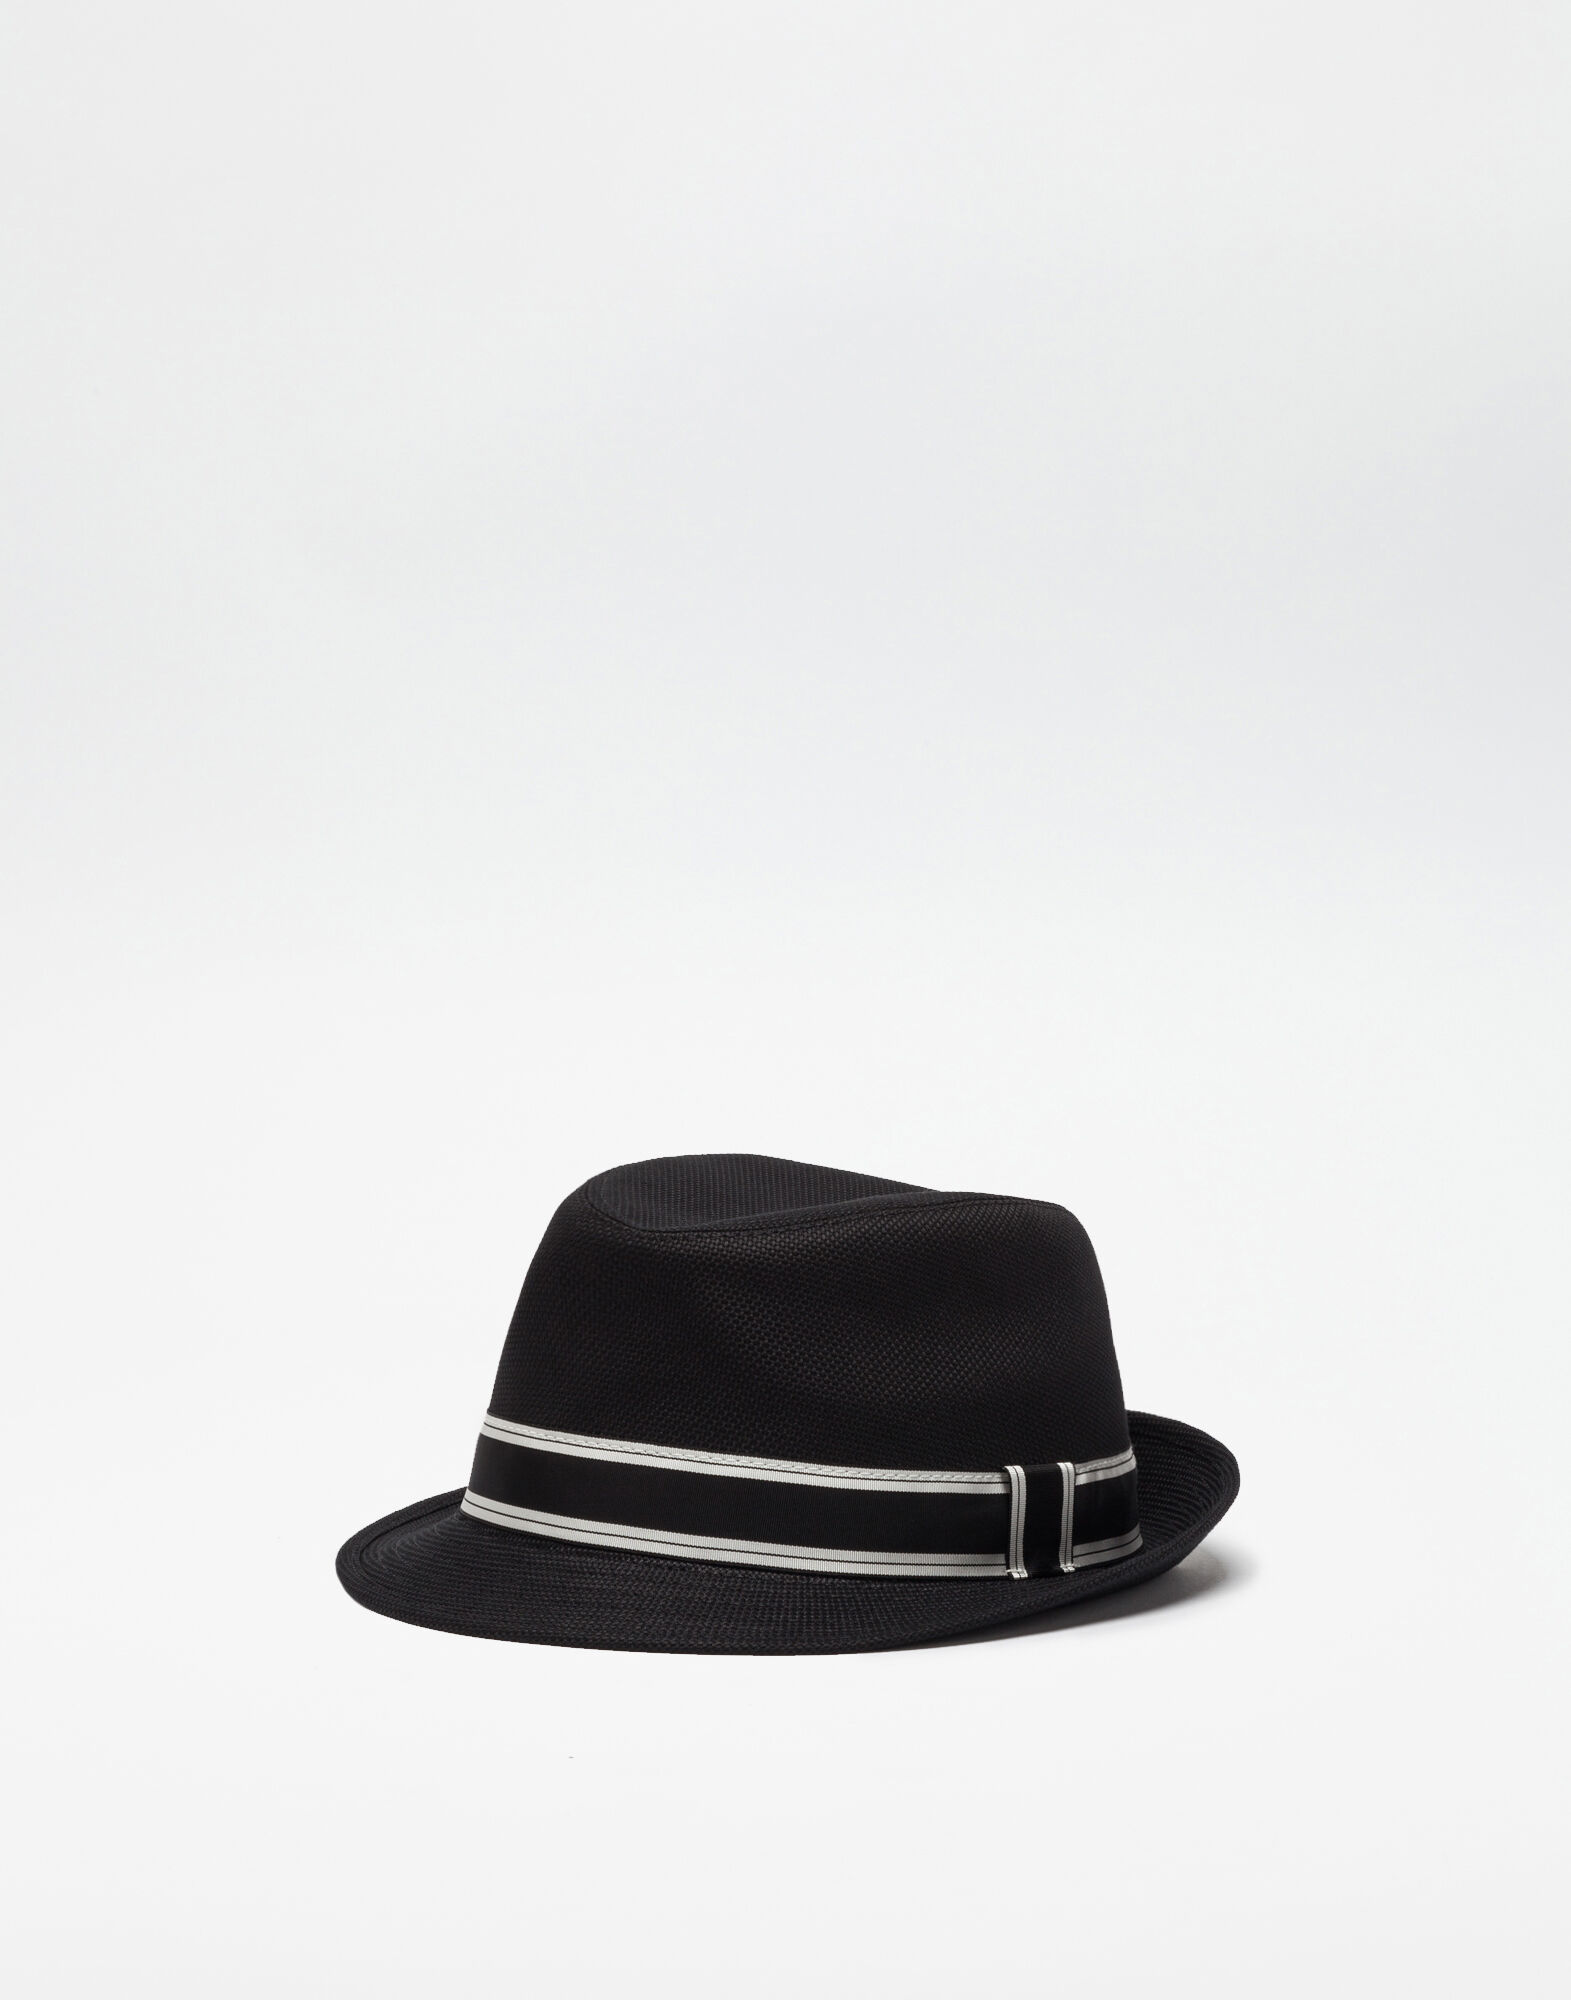 Dolce & Gabbana Trilby Cotton Hat, Black